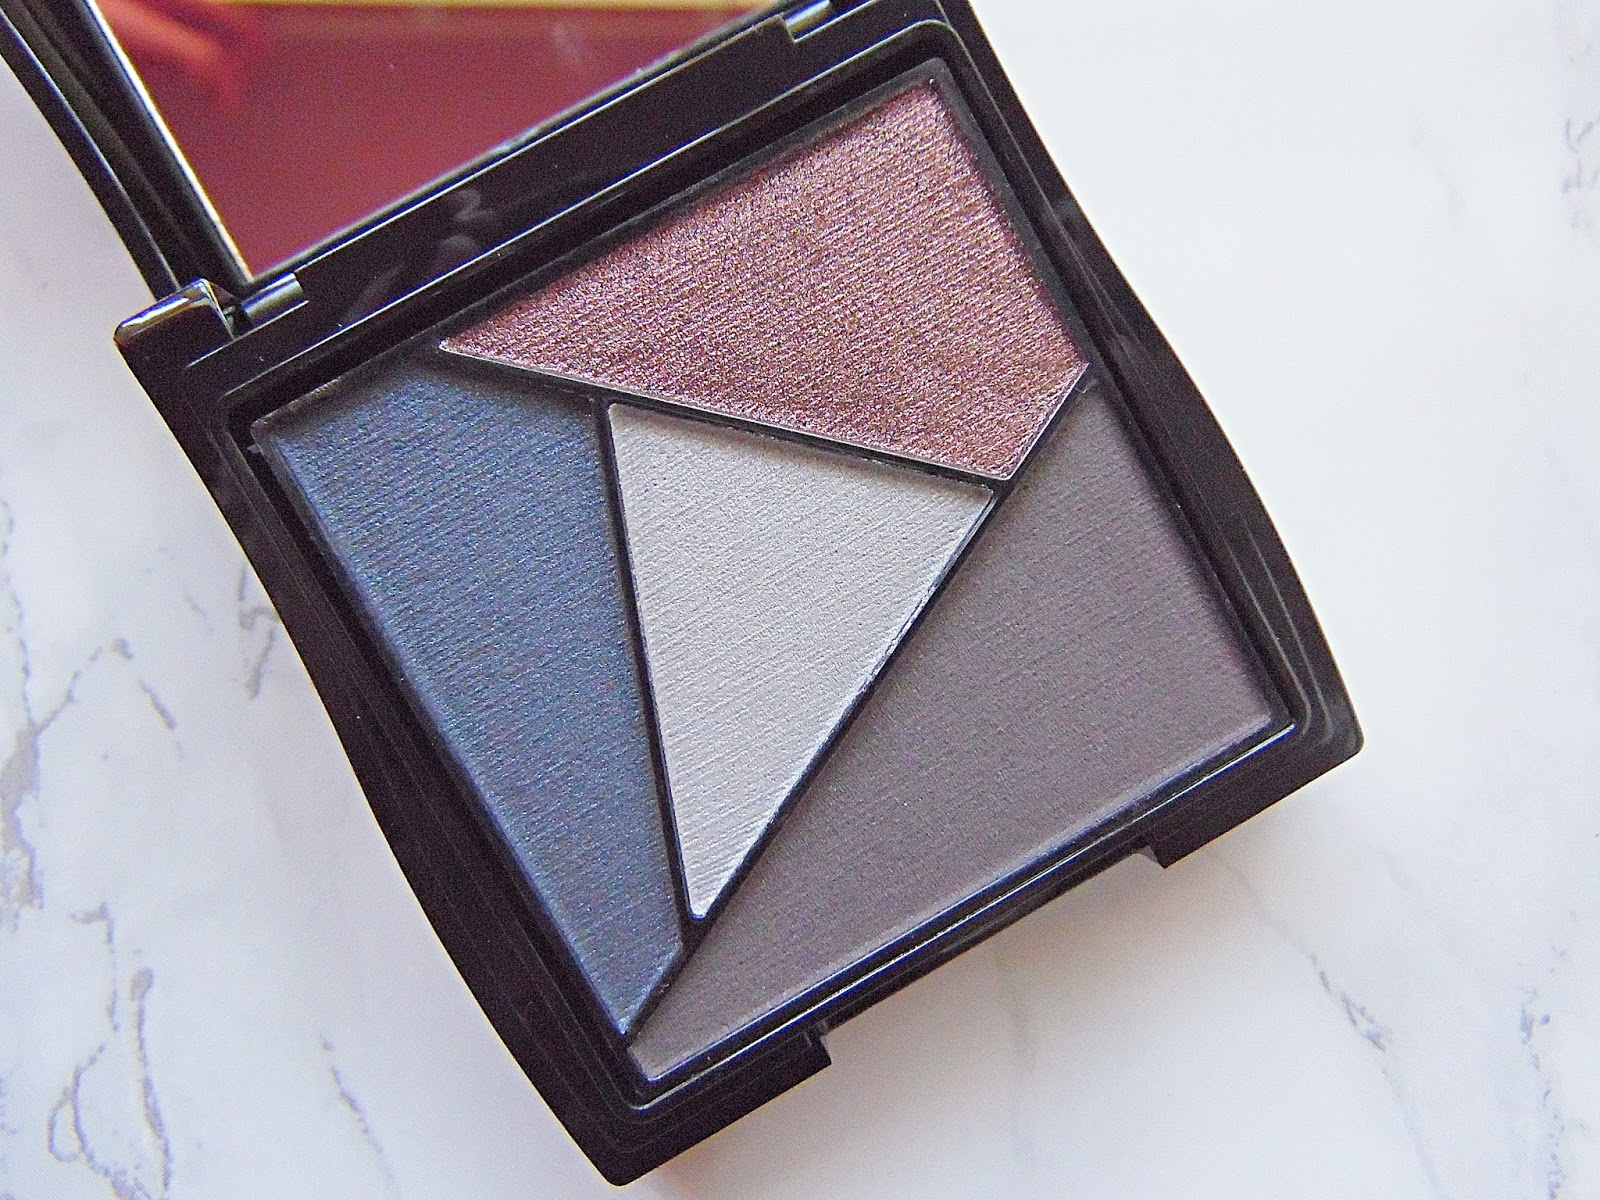 Mary Kay Eyeshadow Palette